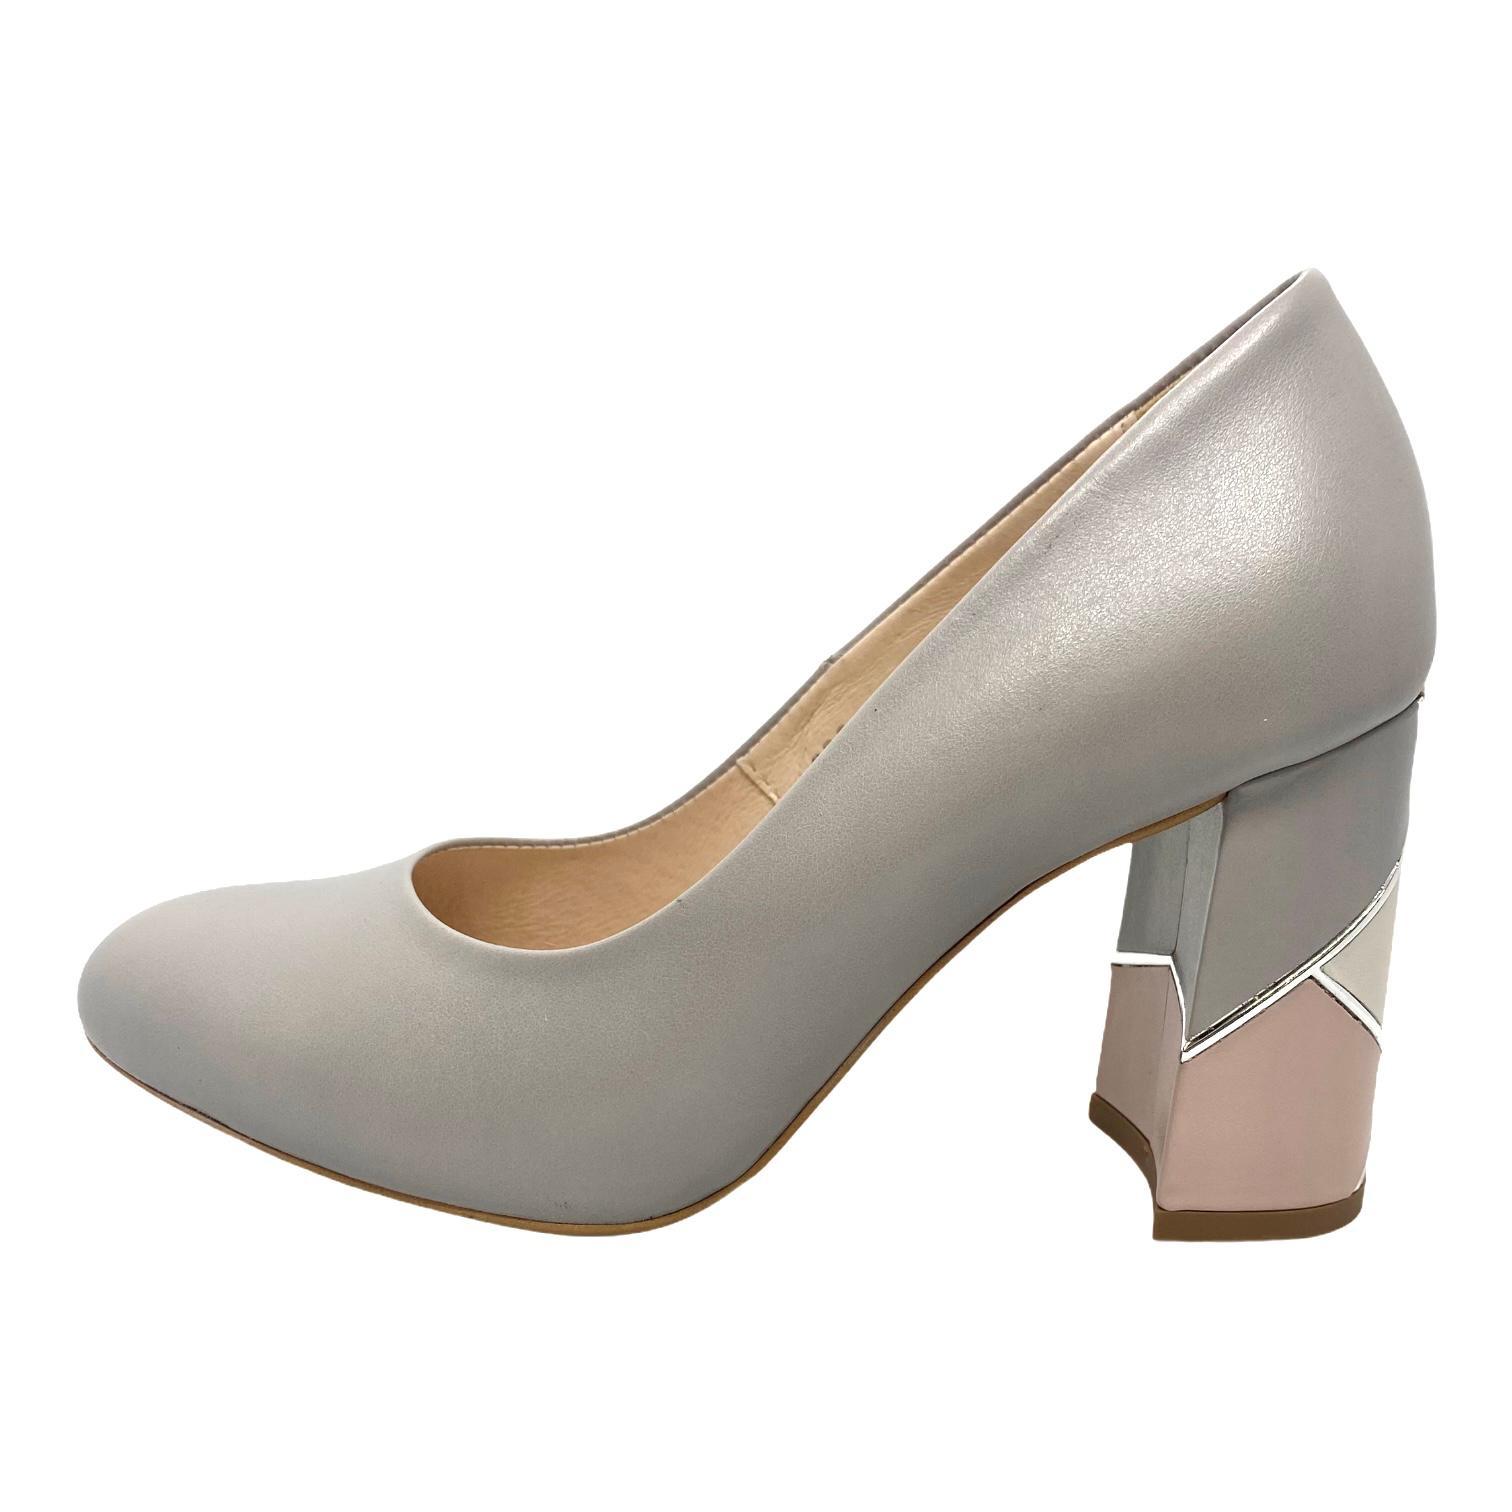 Pantofi Kordel gri cu toc cu model